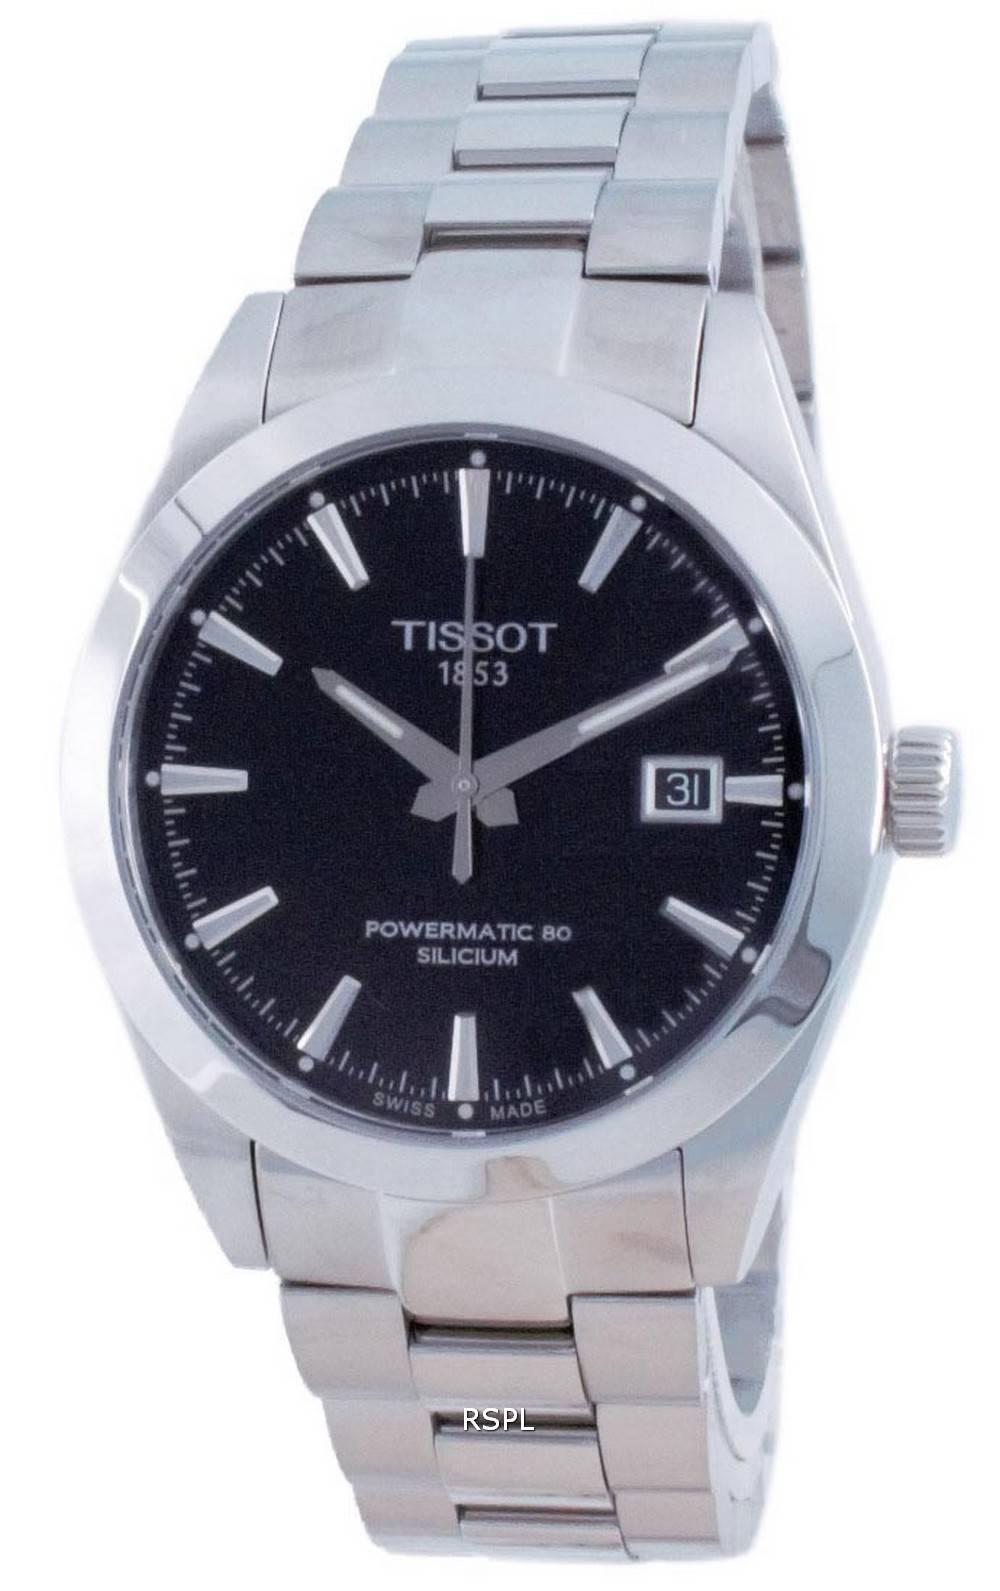 Tissot T-Classic Gentleman Powermatic 80 Silicium Automatic T127.407.11.051.00 T1274071105100 100M Men's Watch